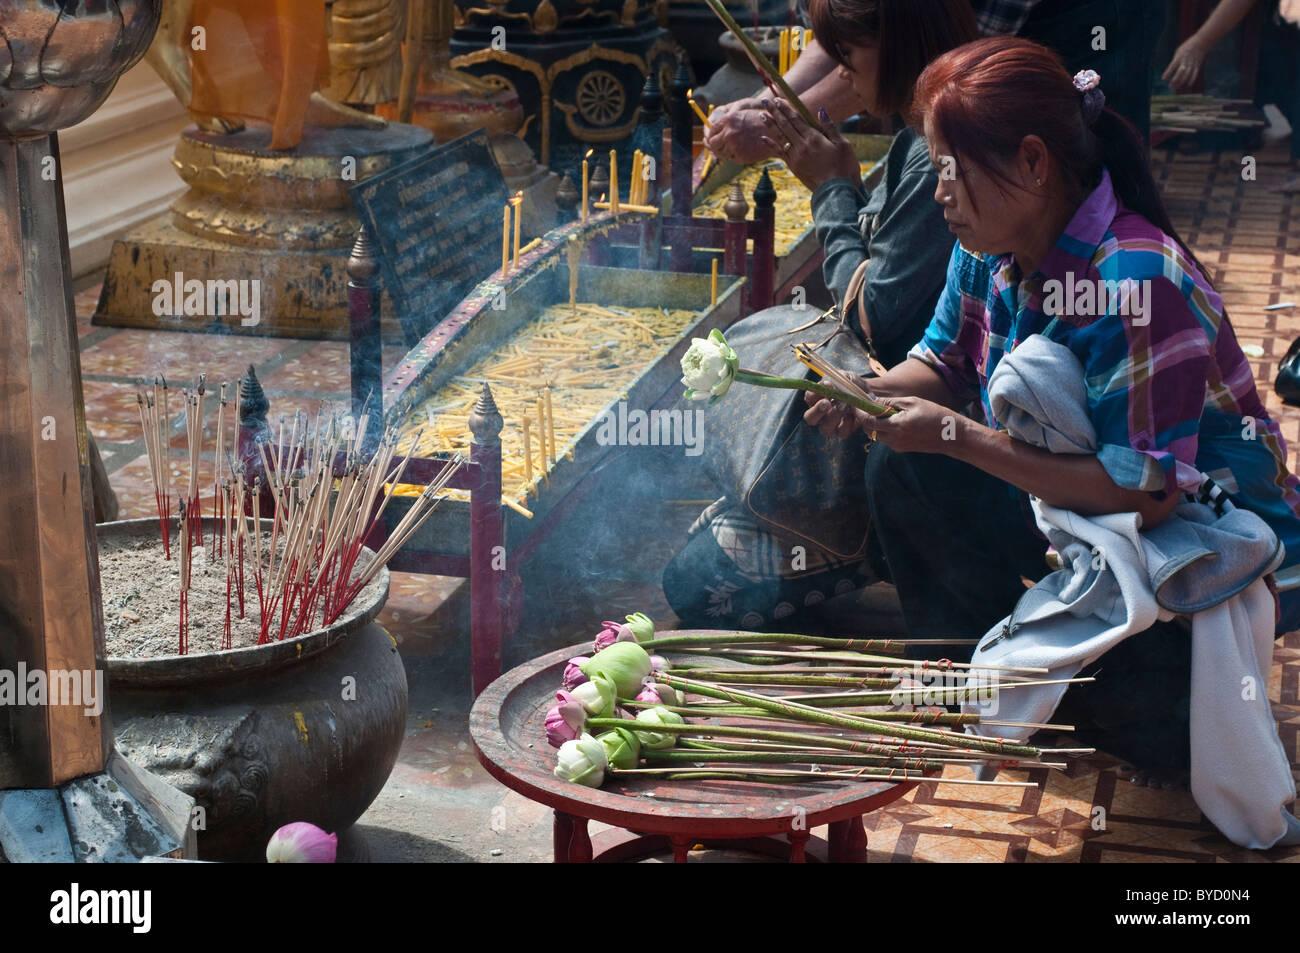 Worshiper placing candles, Wat Phra That Doi Suthep, Chiang Mai, Thailand - Stock Image